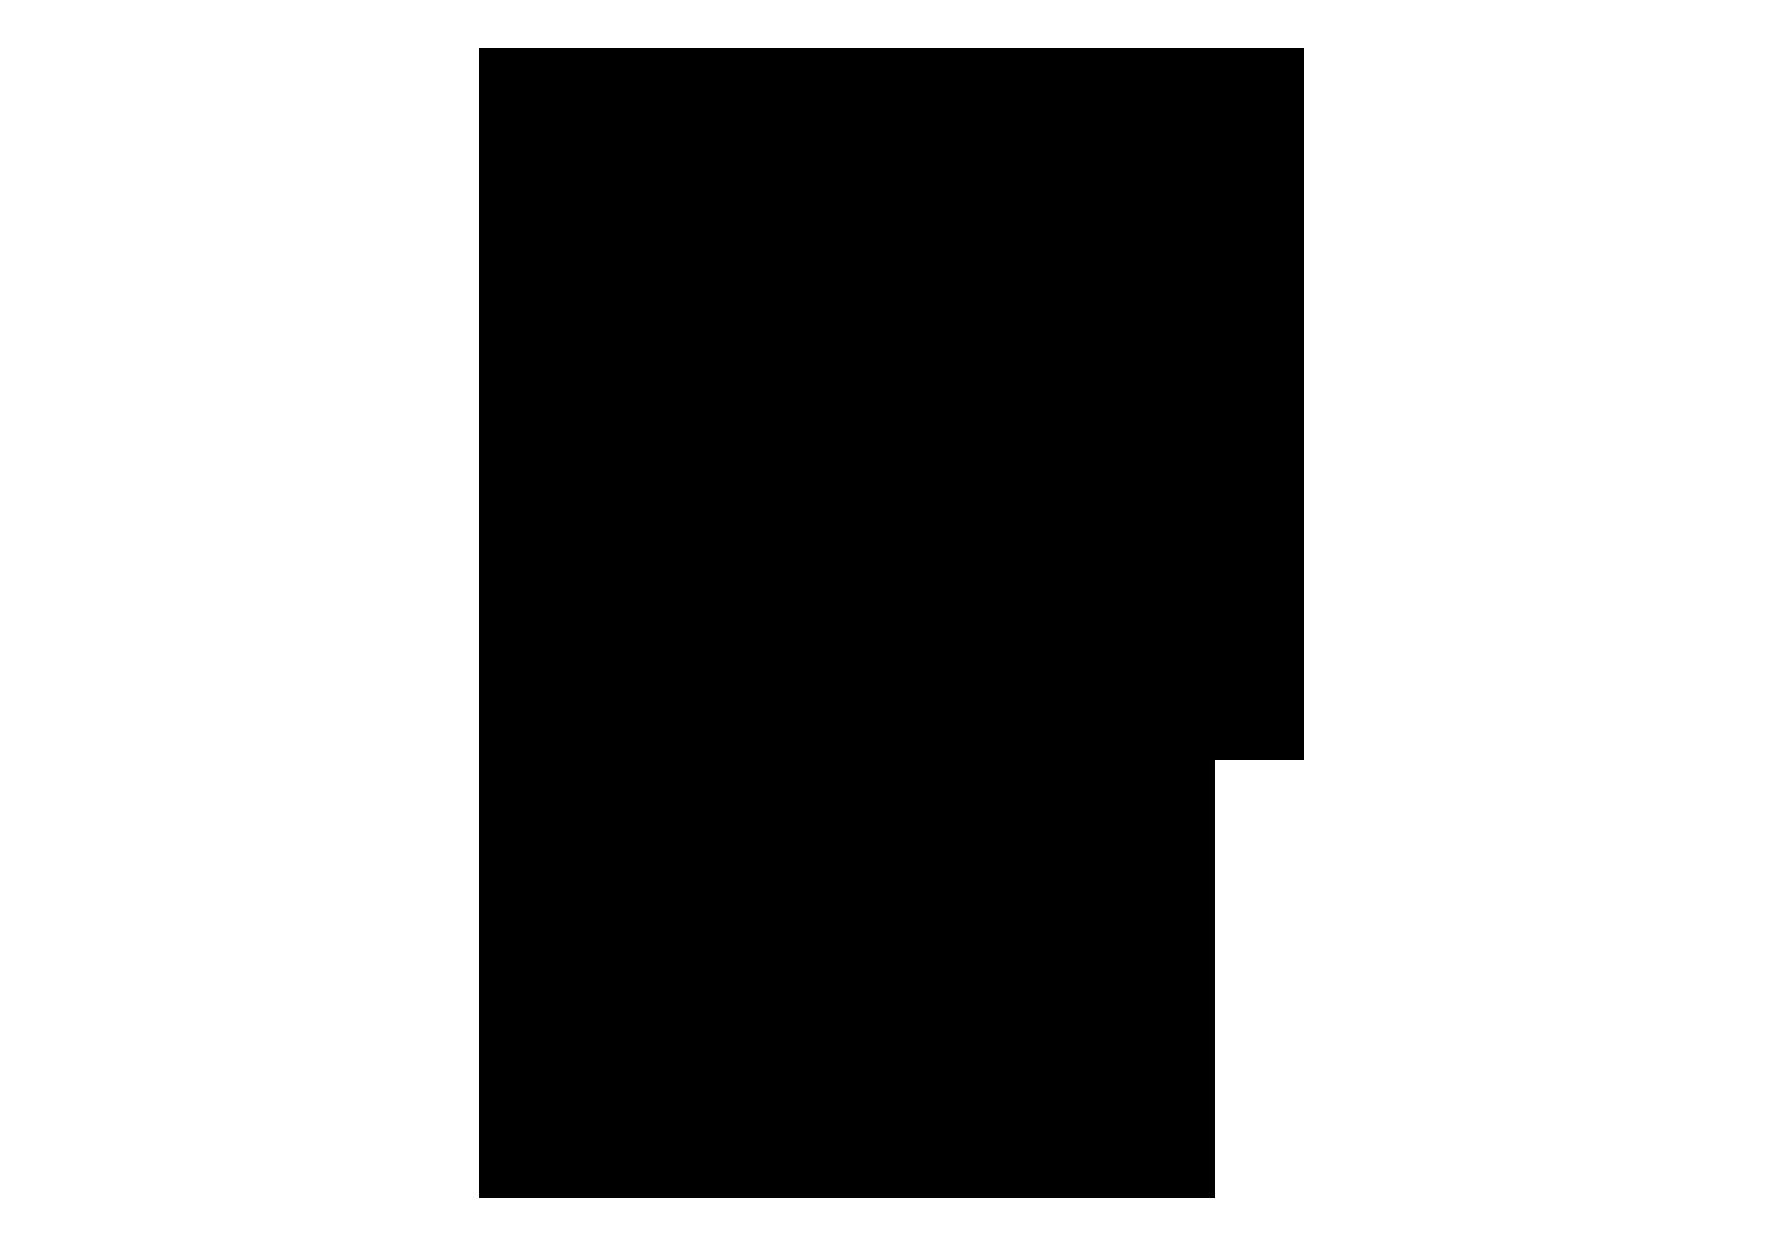 مخطوطه رمضان كريم مفرغه 13 15 مخطوطه لشهر رمضان بالخط الحر png